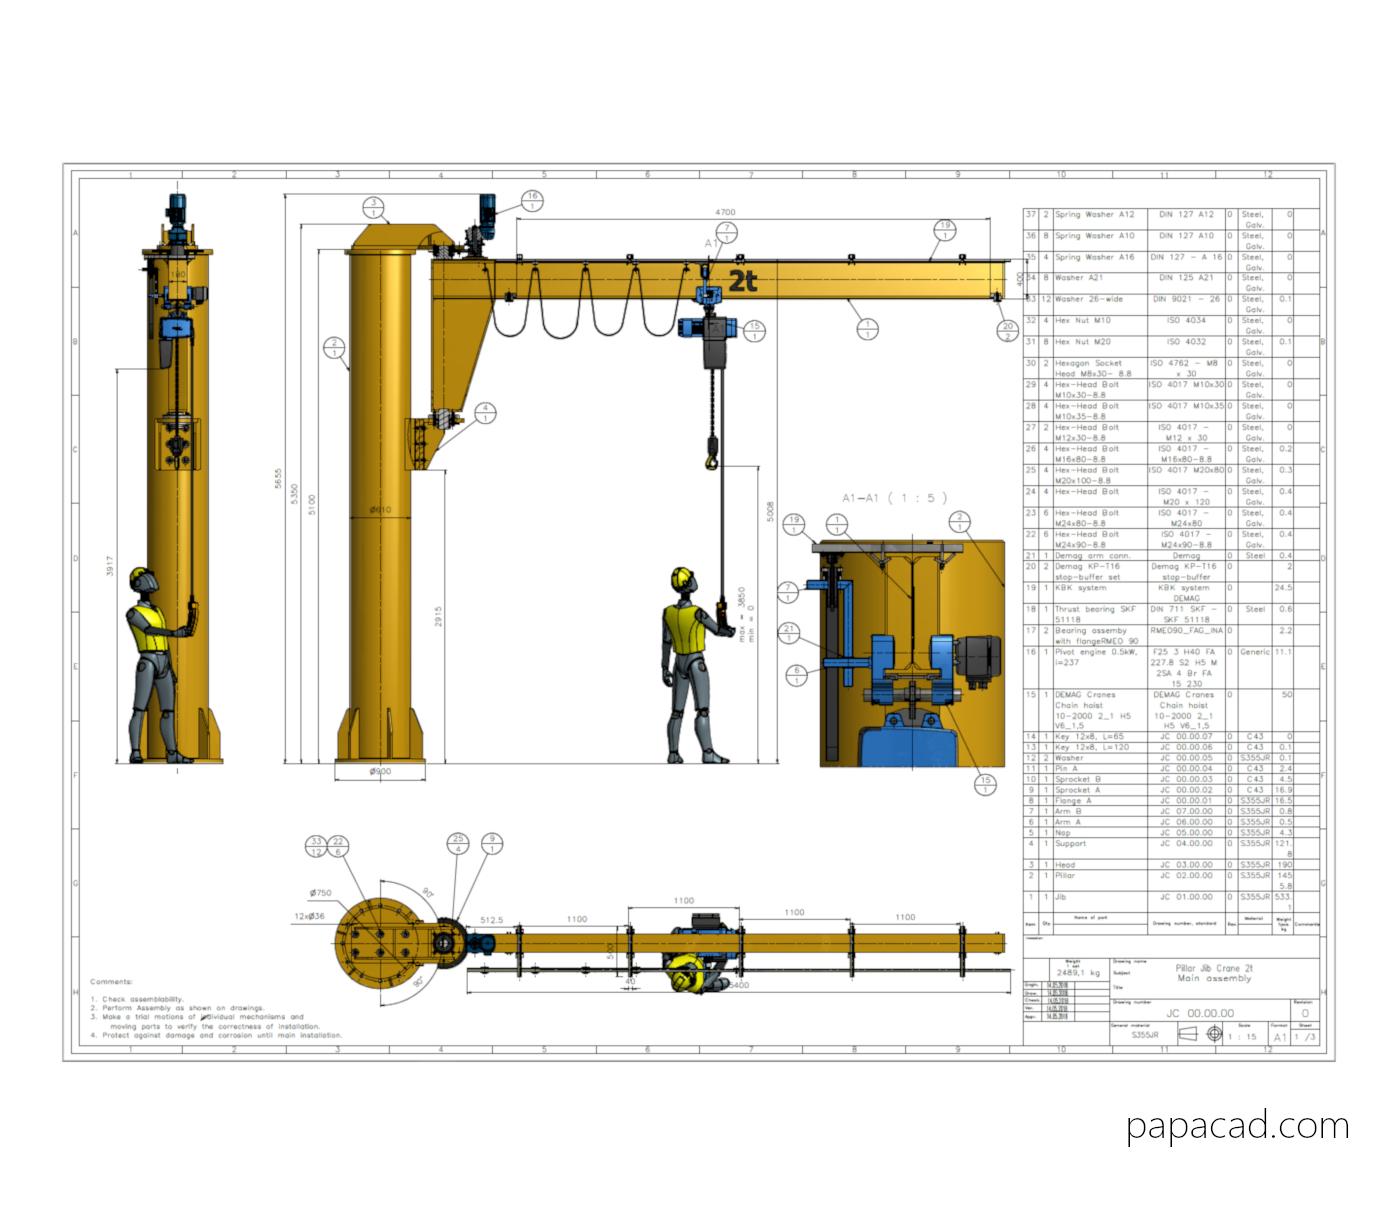 Jib Crane Design Drawings Dwg And Pdf With 3d Models Papacad Com